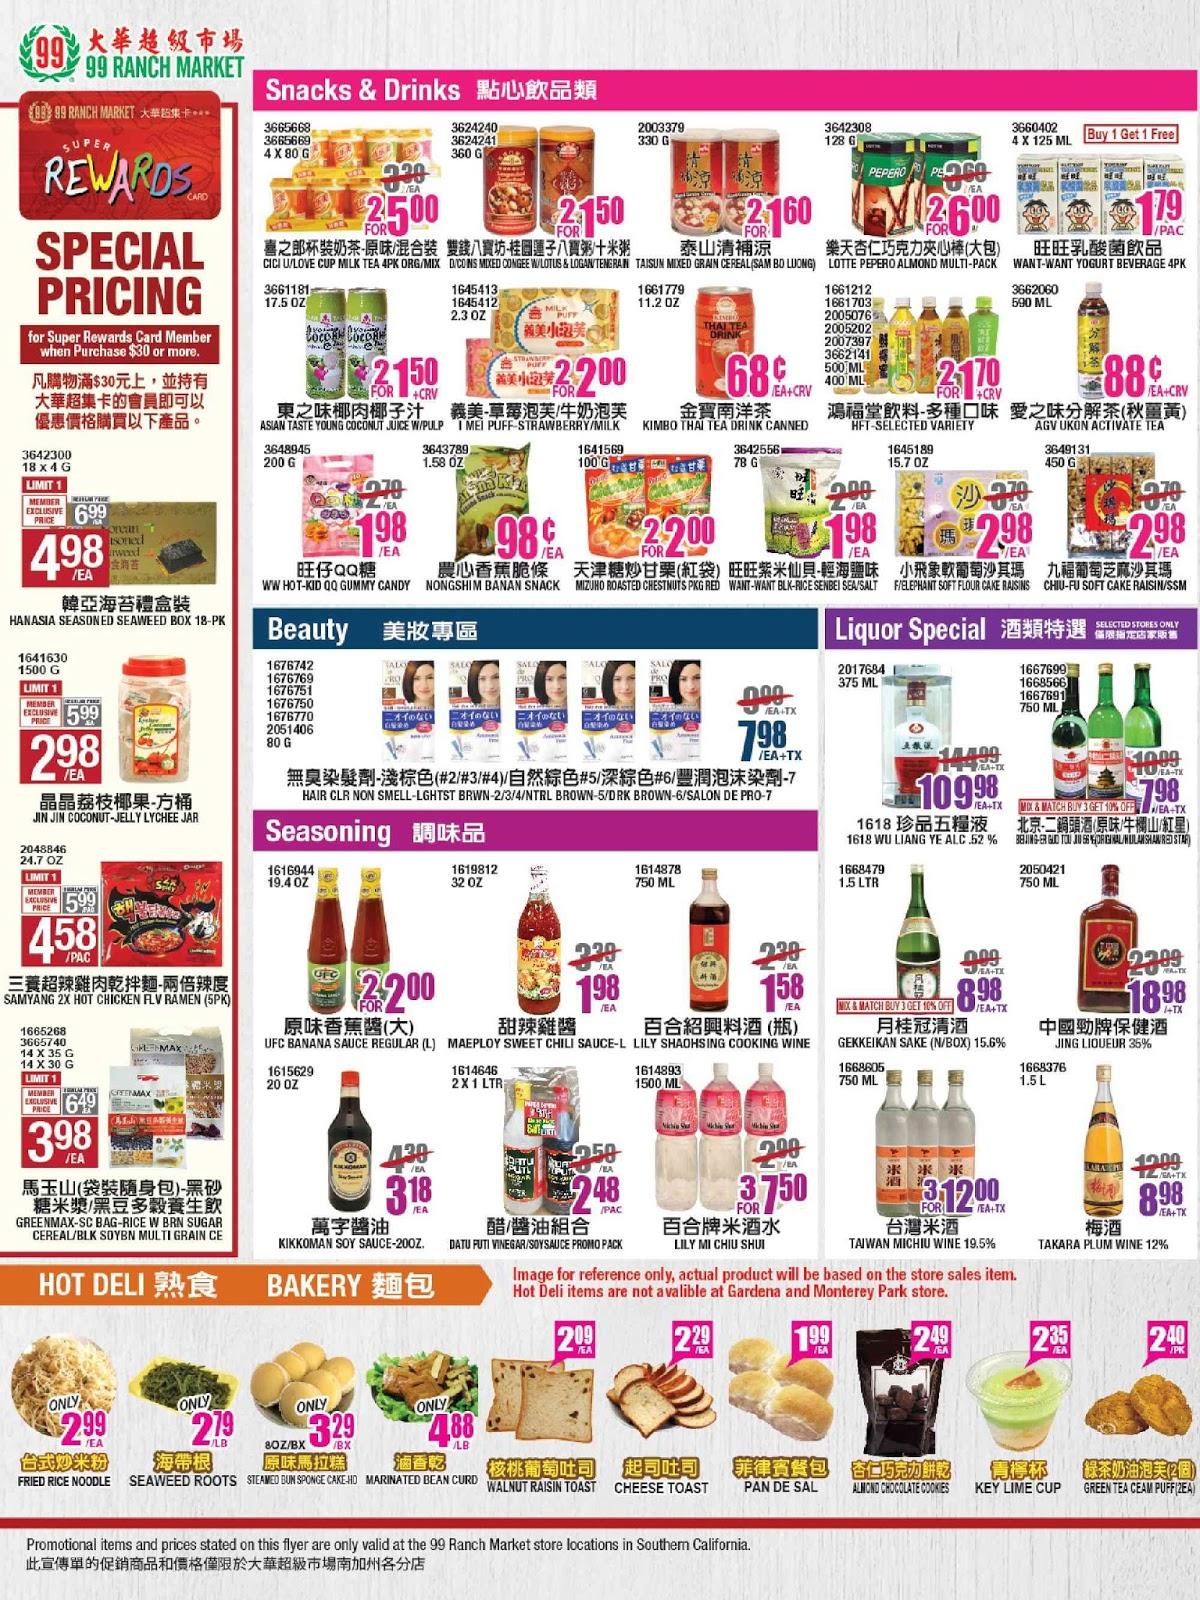 99 Ranch Market Weekly Ad